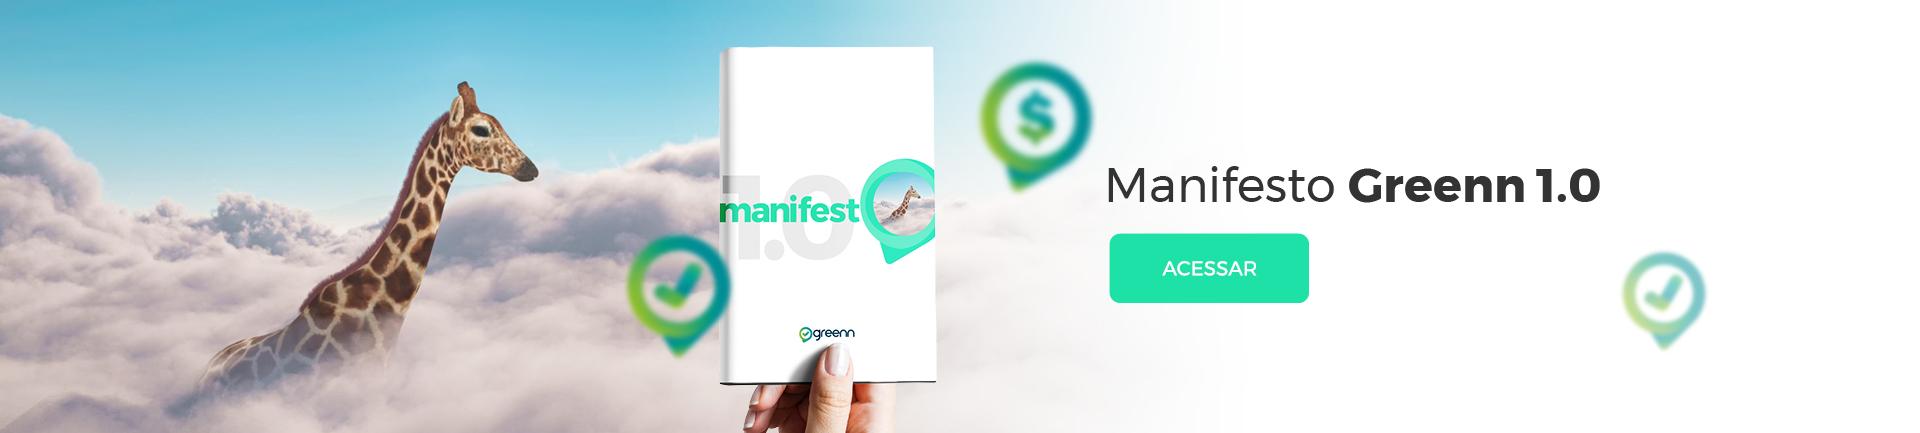 greenn_manifesto_